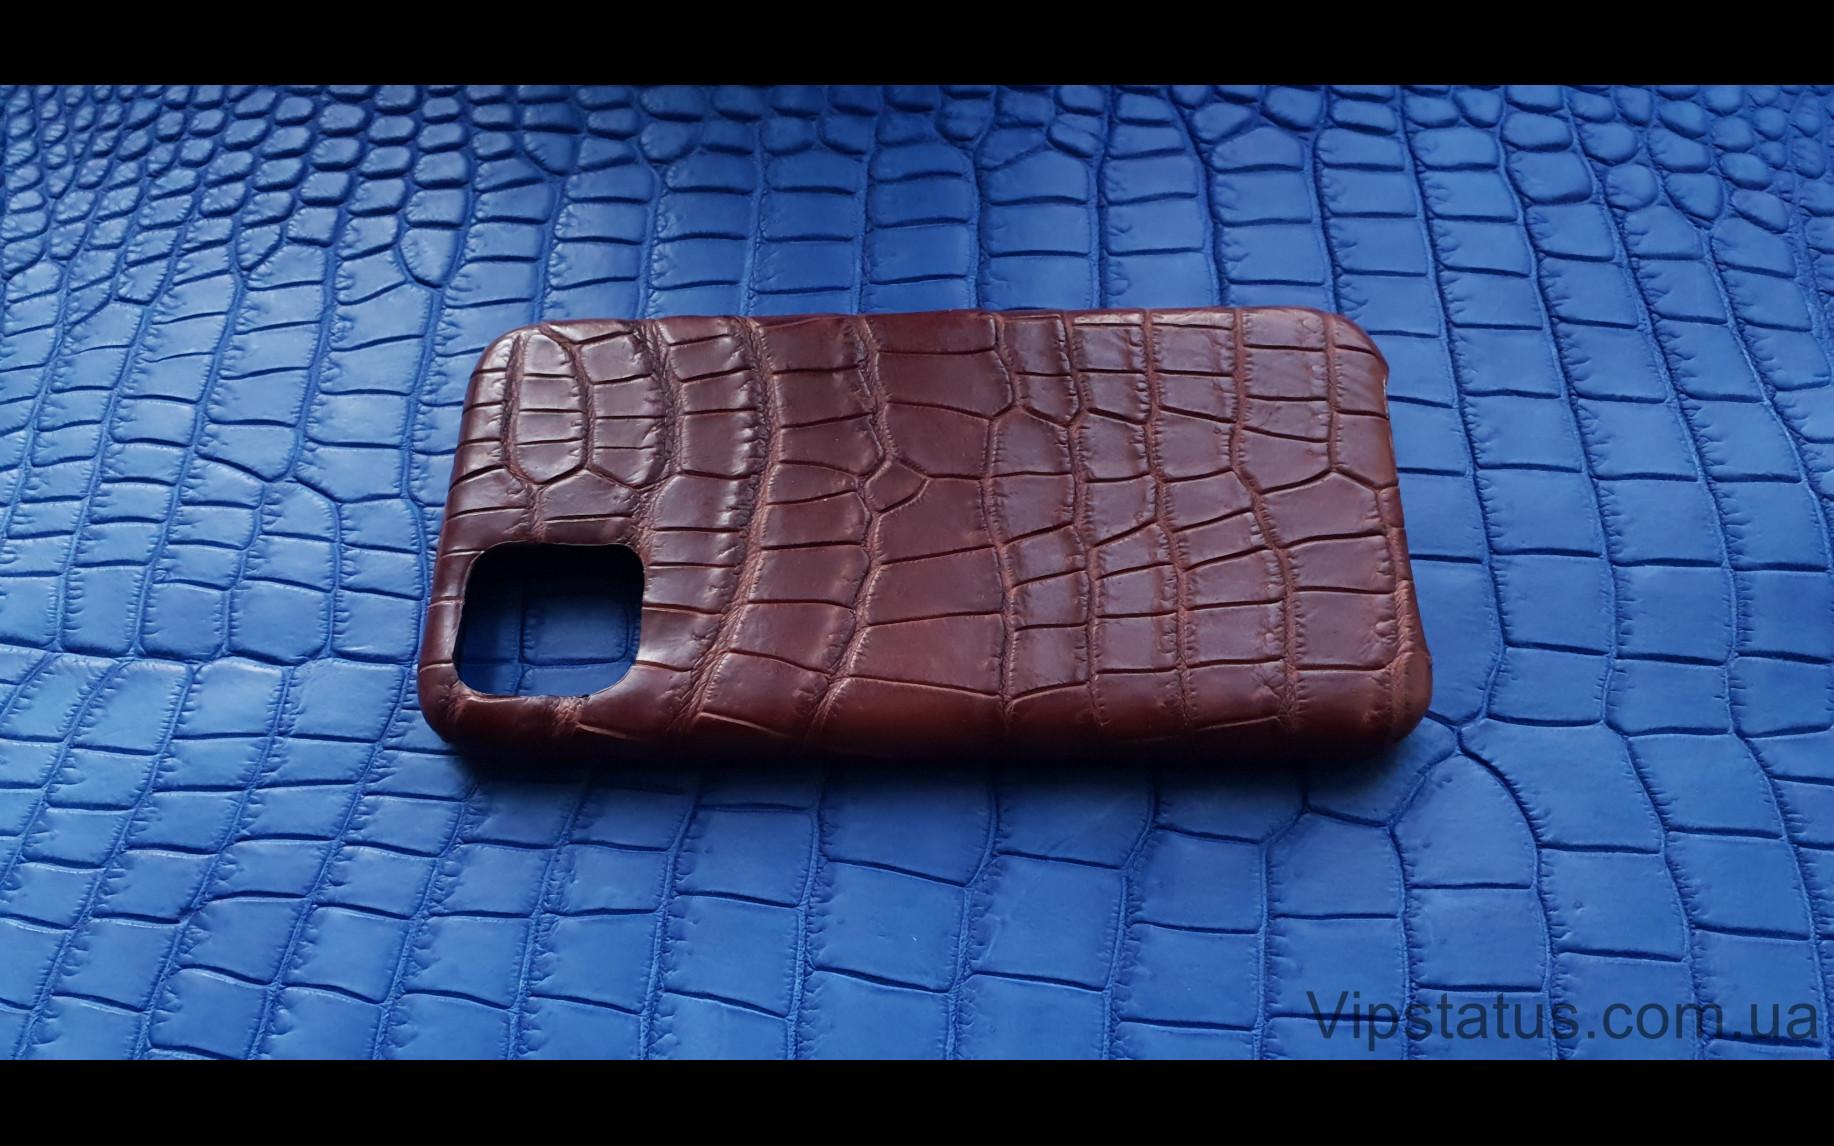 Elite Rich Crocodile Эксклюзивный чехол IPhone 11 Pro Max Rich Crocodile Exclusive case IPhone 11 Pro Max Crocodile leather image 3